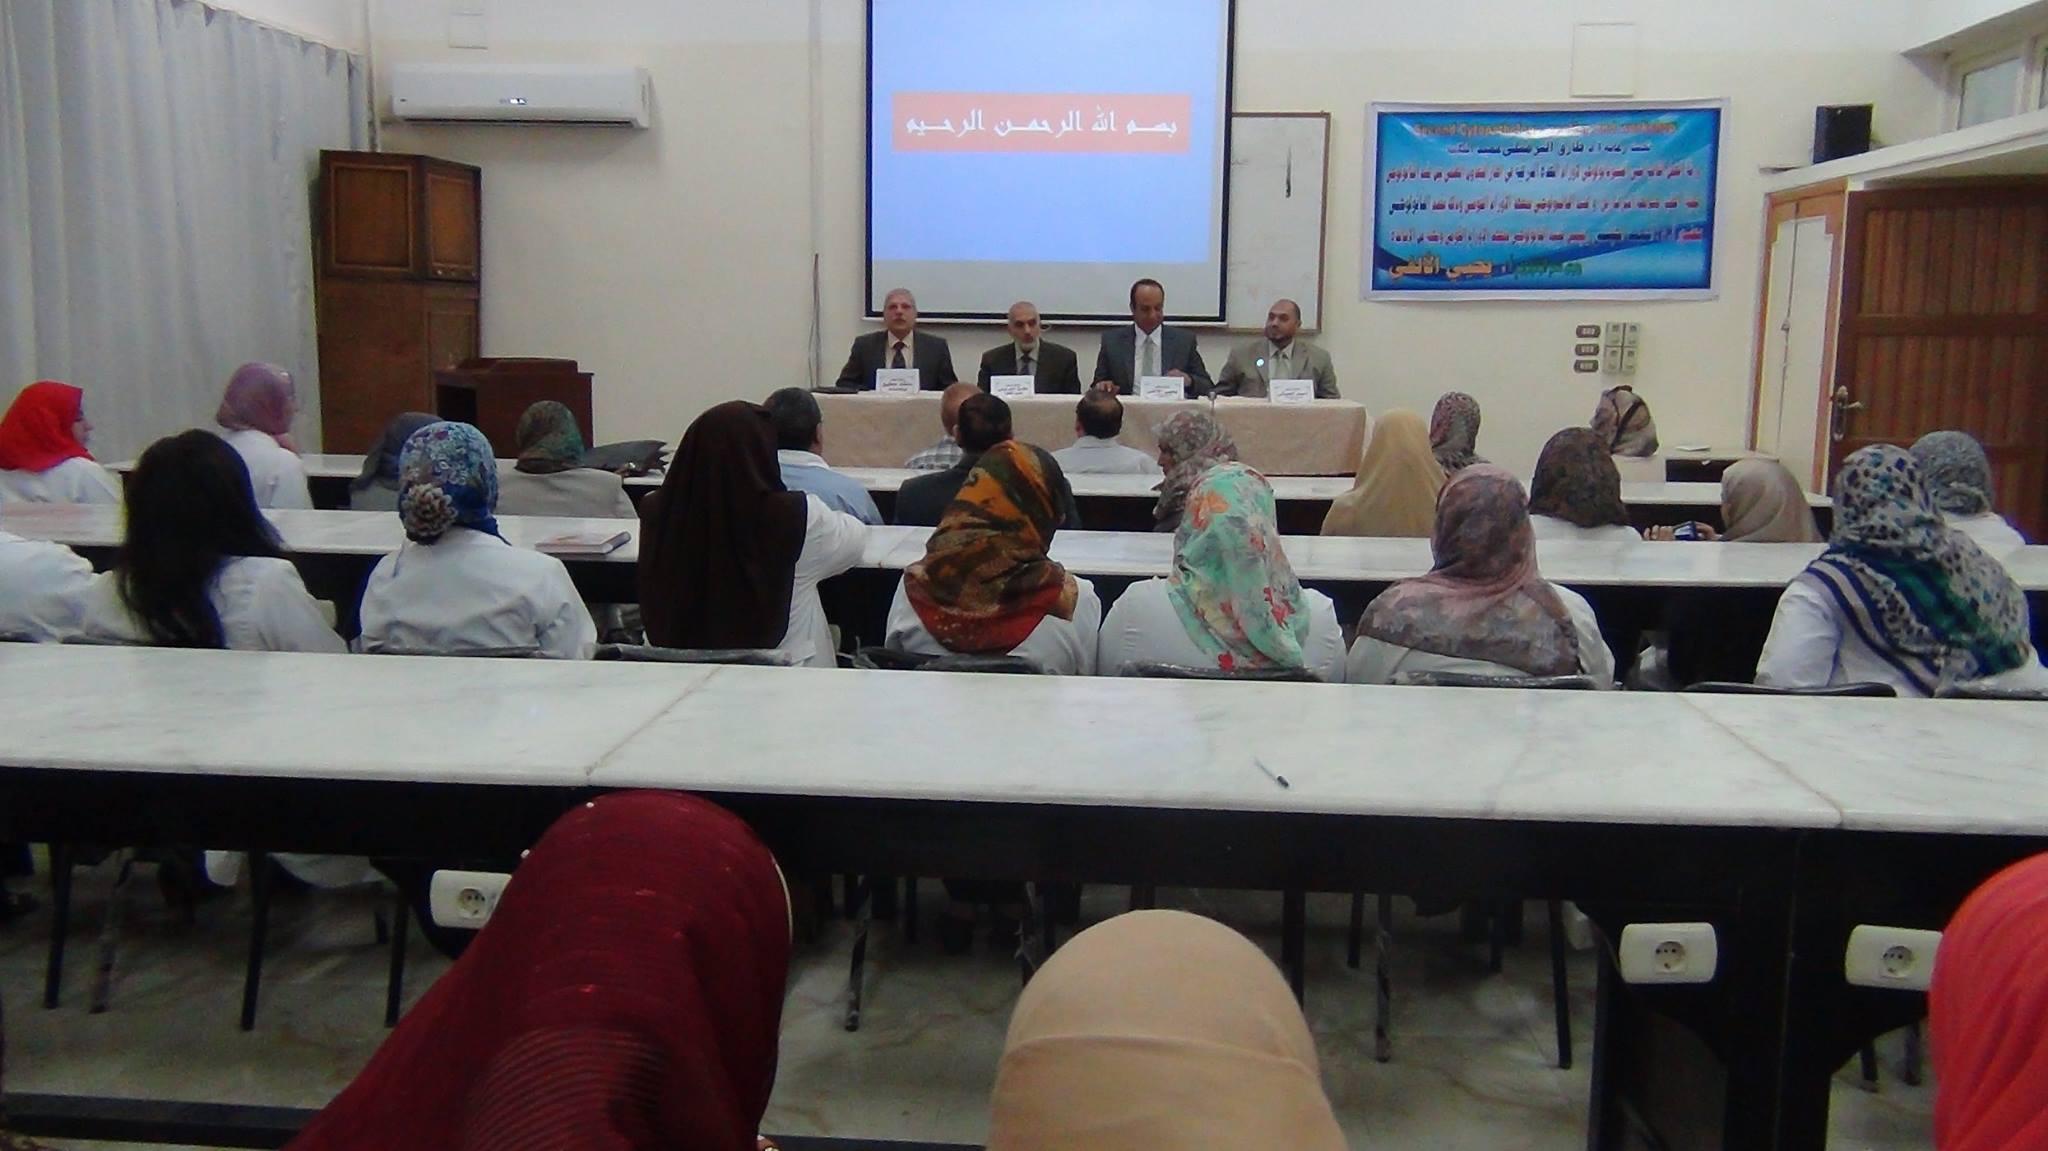 The second workshop in Alsitobathulojy thyroid tumors